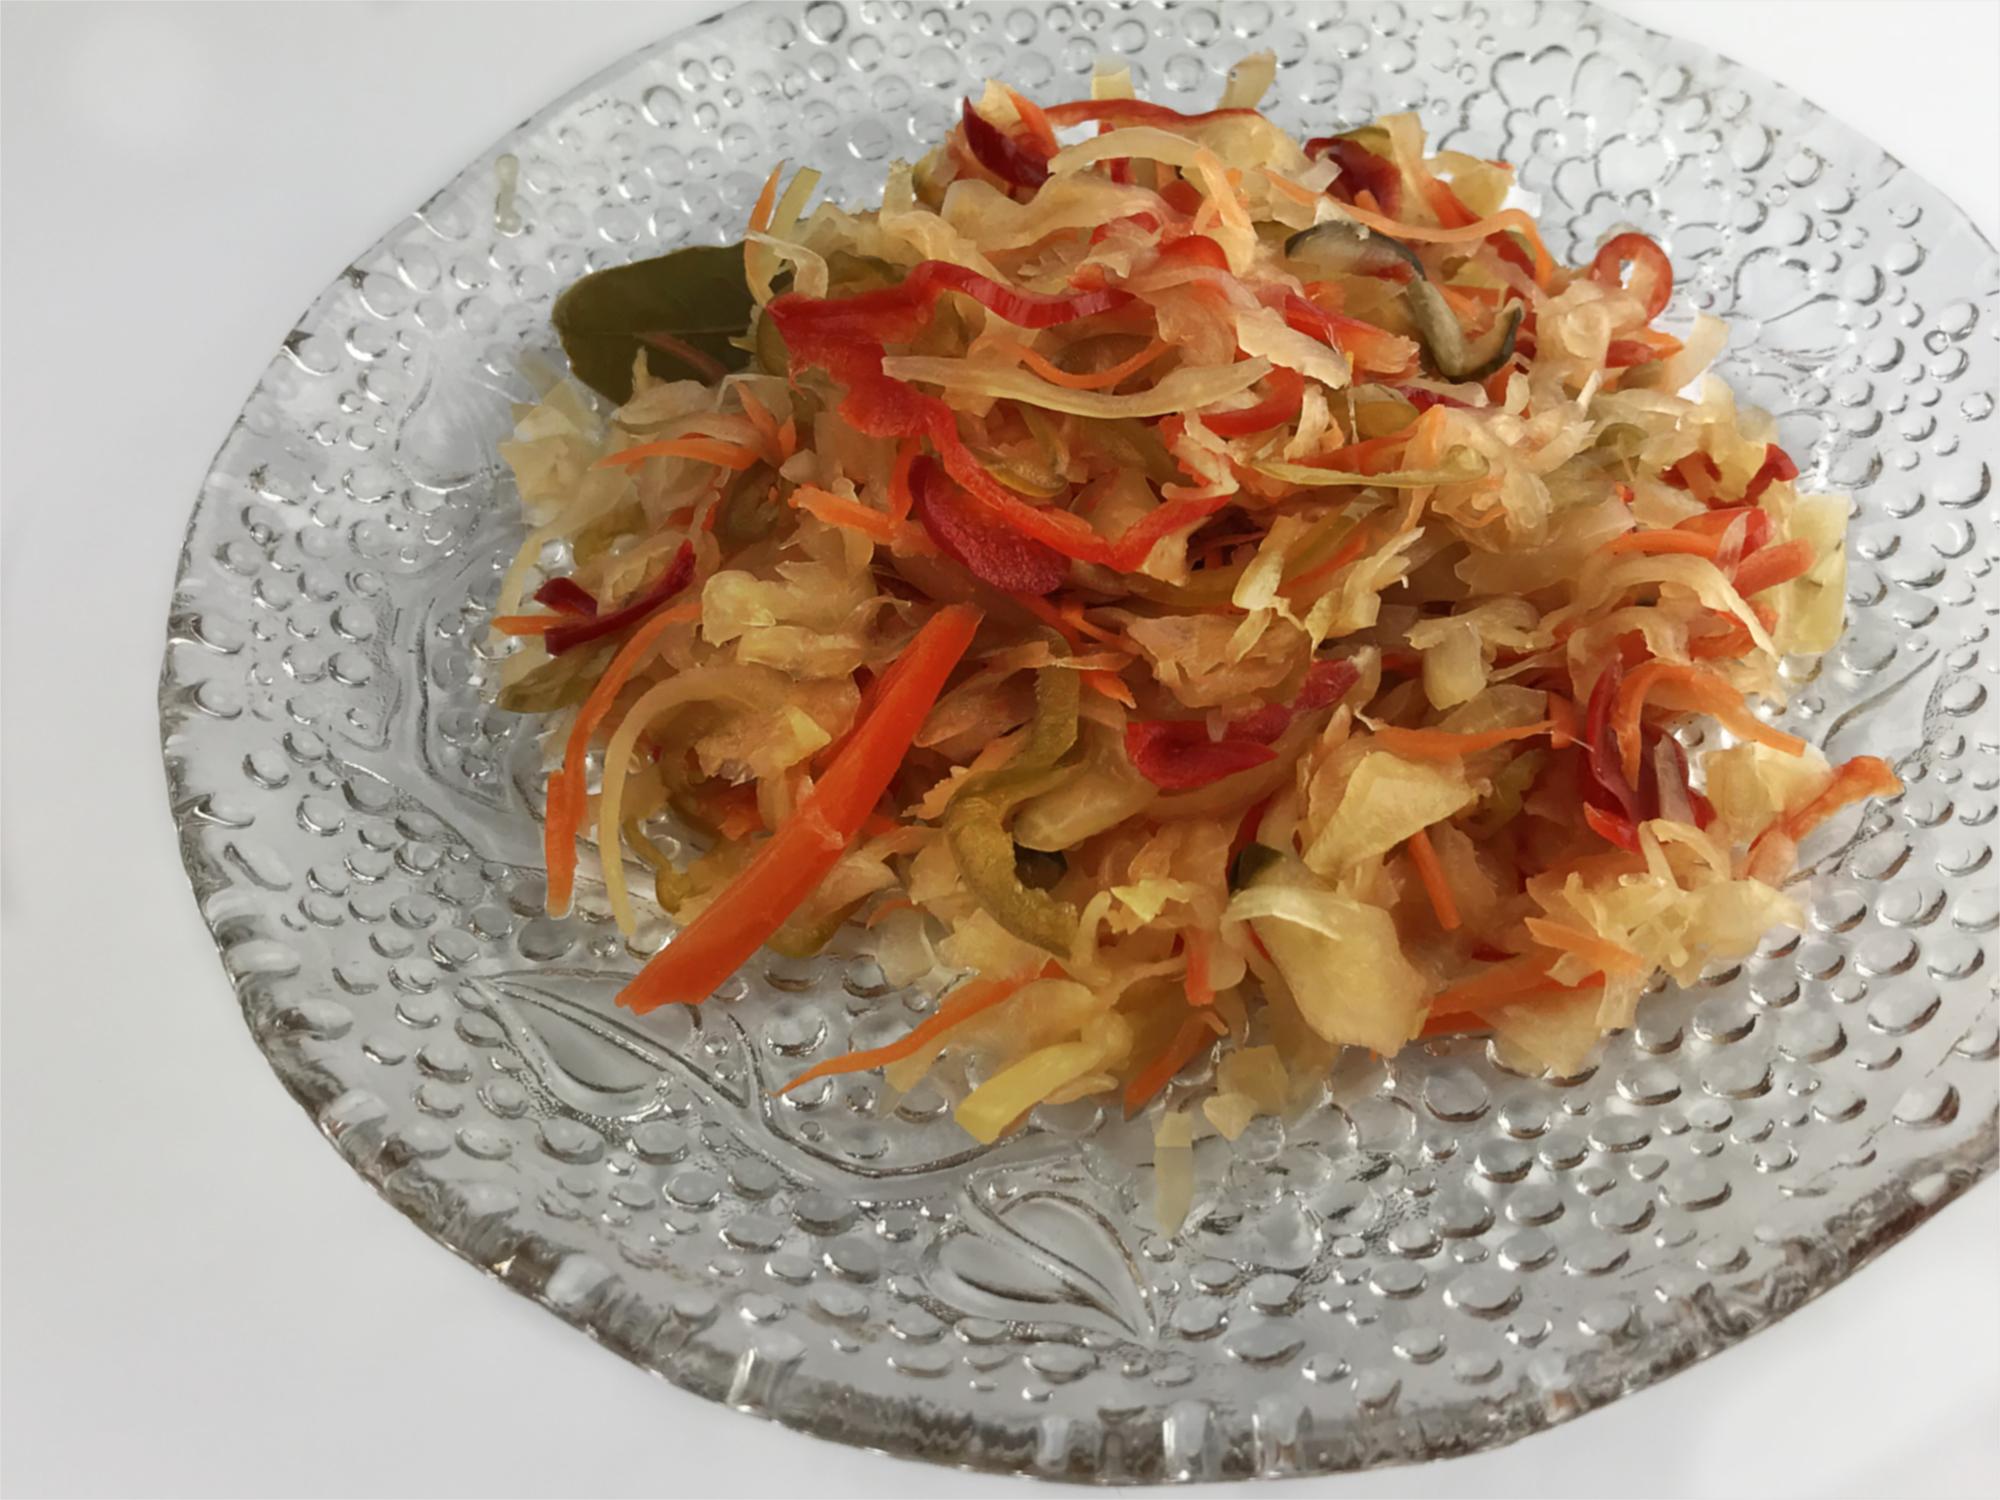 Nakladaná kvasená alebo fermentovaná zelenina - Pickles